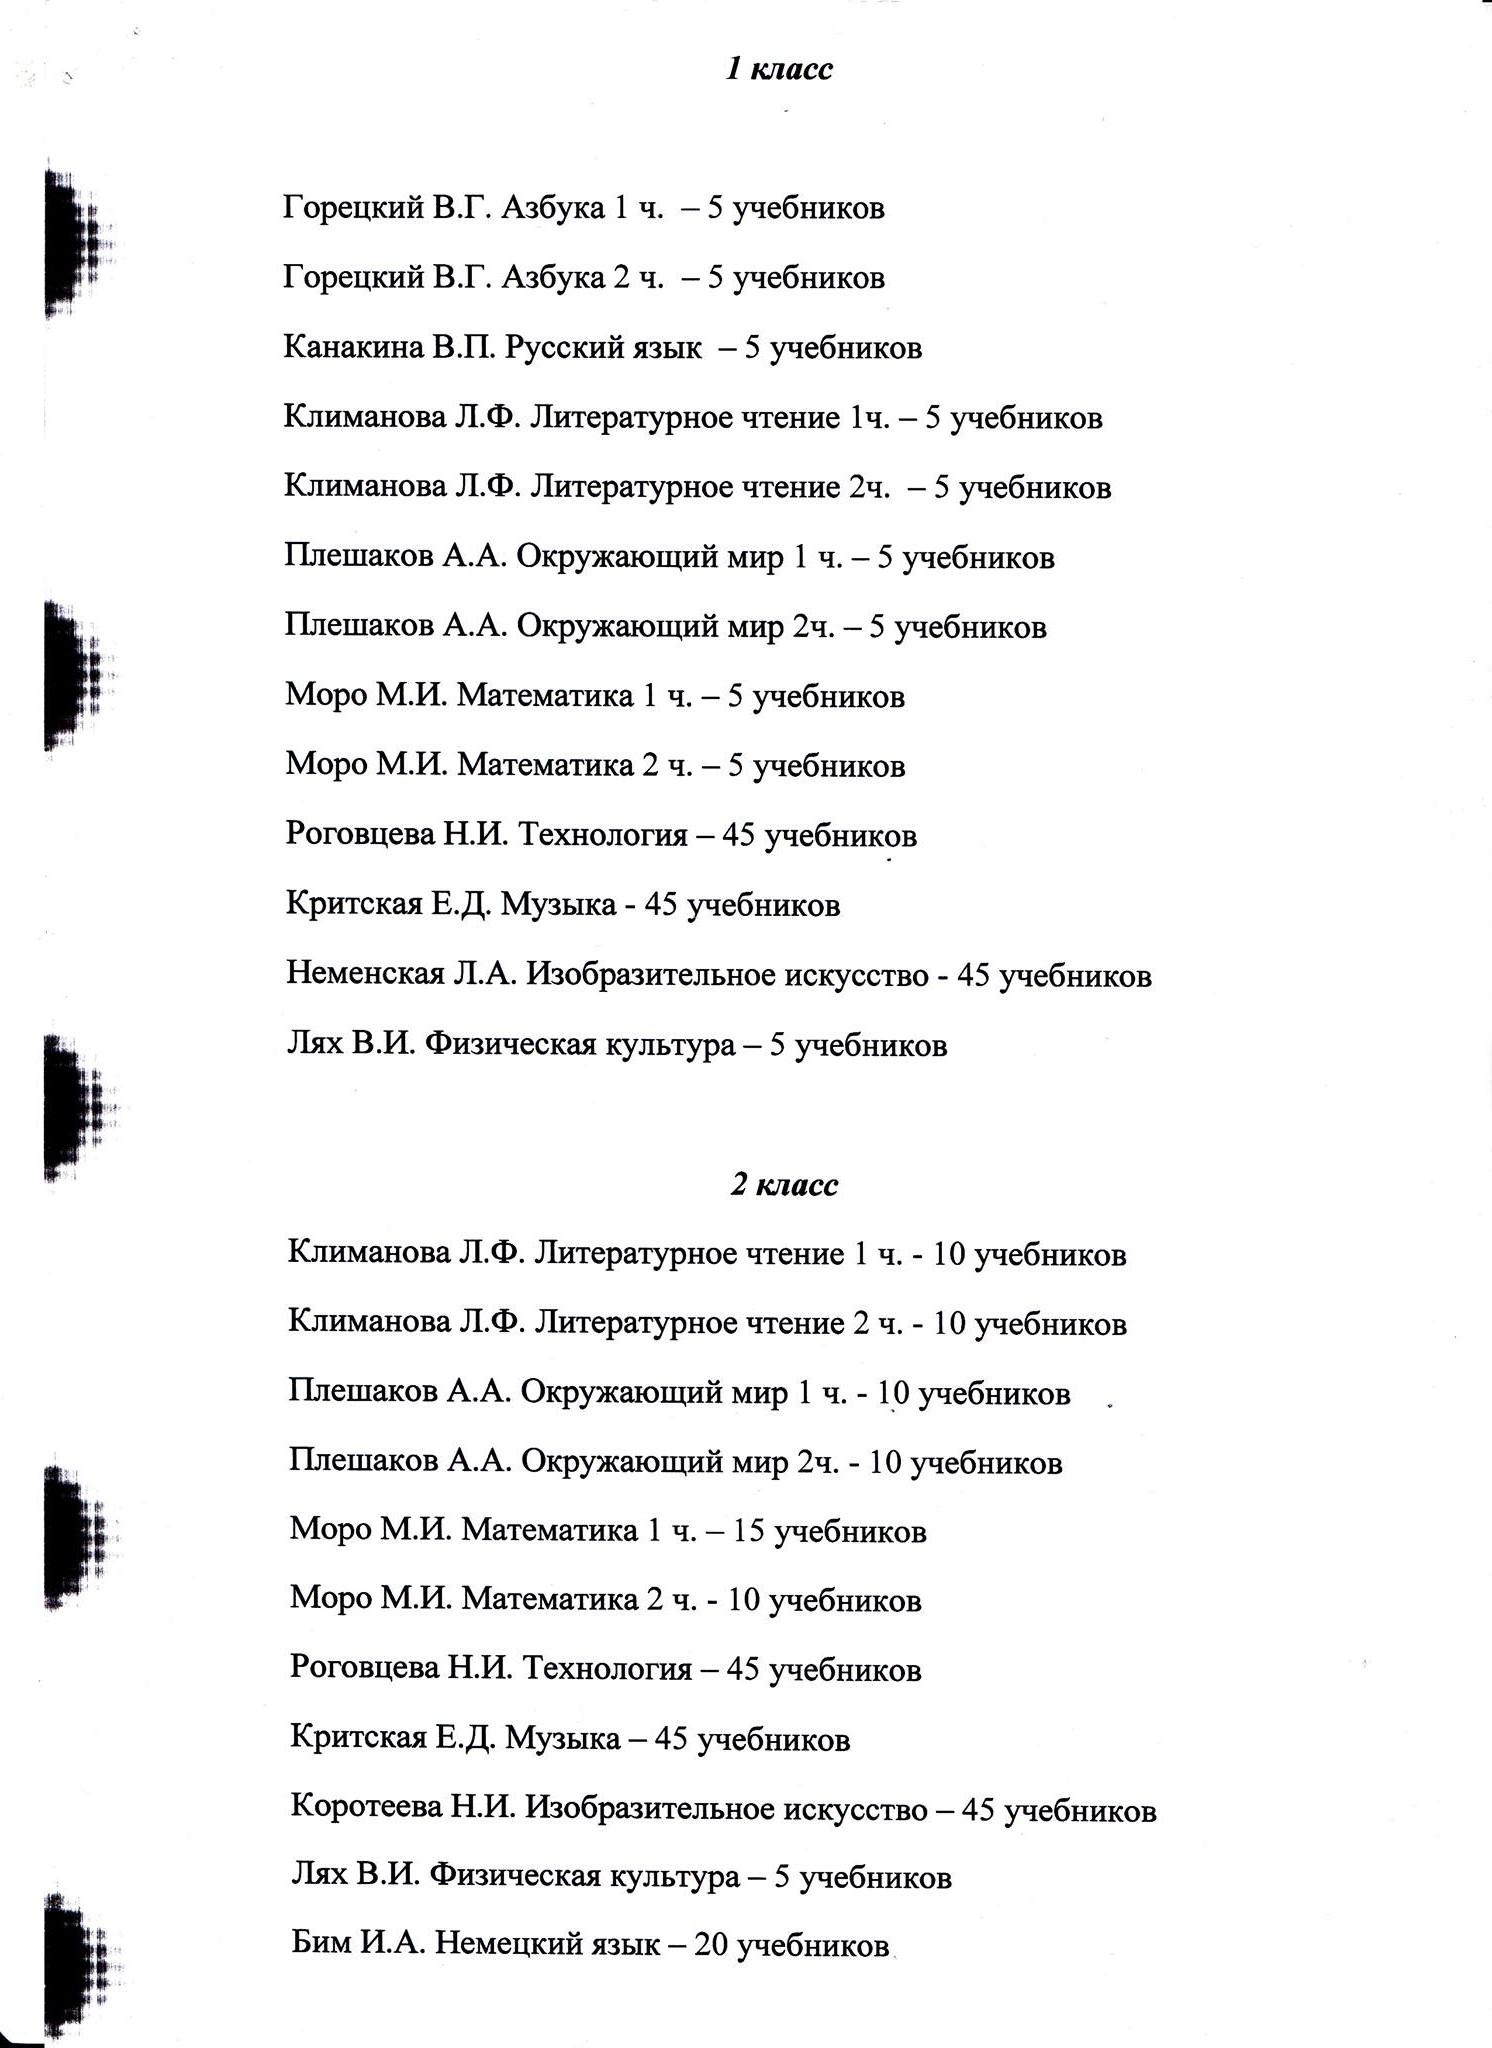 https://img-fotki.yandex.ru/get/229651/36058990.62/0_1657bf_f84135de_orig